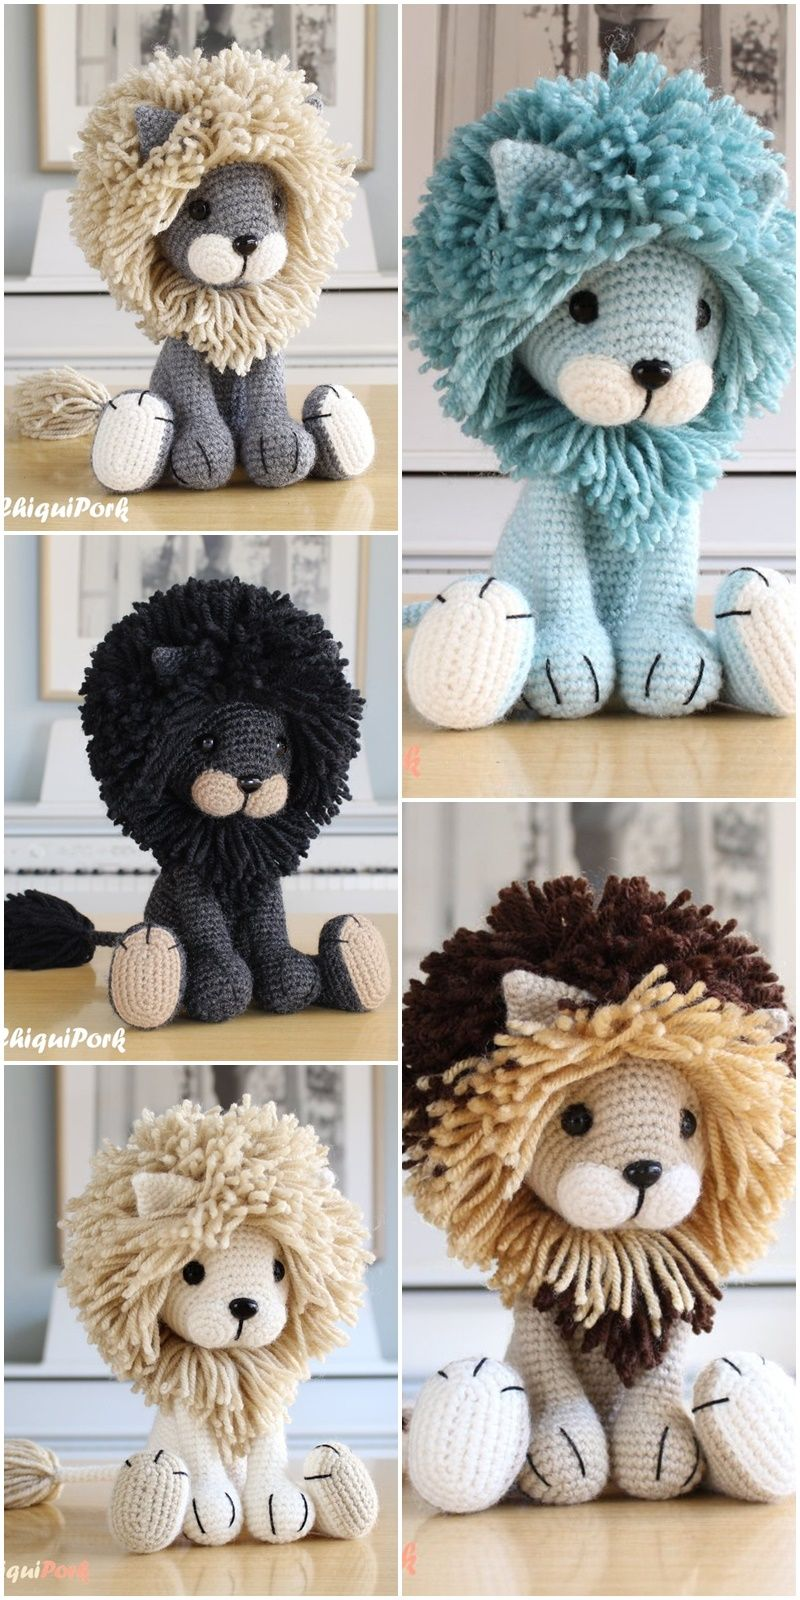 Free Amigurumi Doll And Animal Crochet Patterns - Amigurumi #crochetdoll